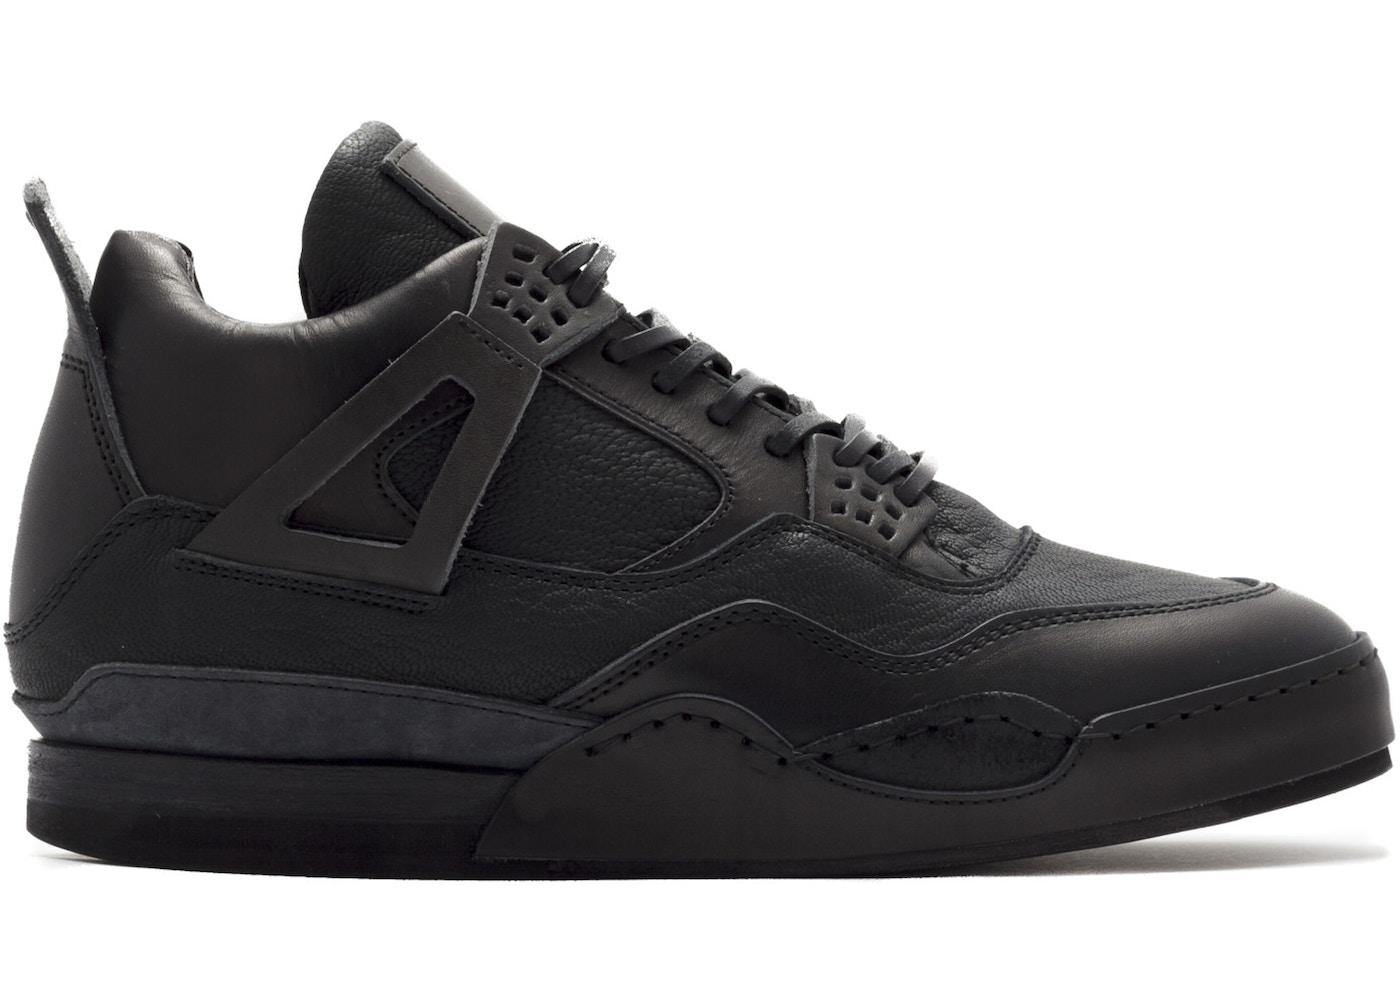 60792cdfa19e8e Hender Scheme MIP-10 Jordan 4 Black - TBD